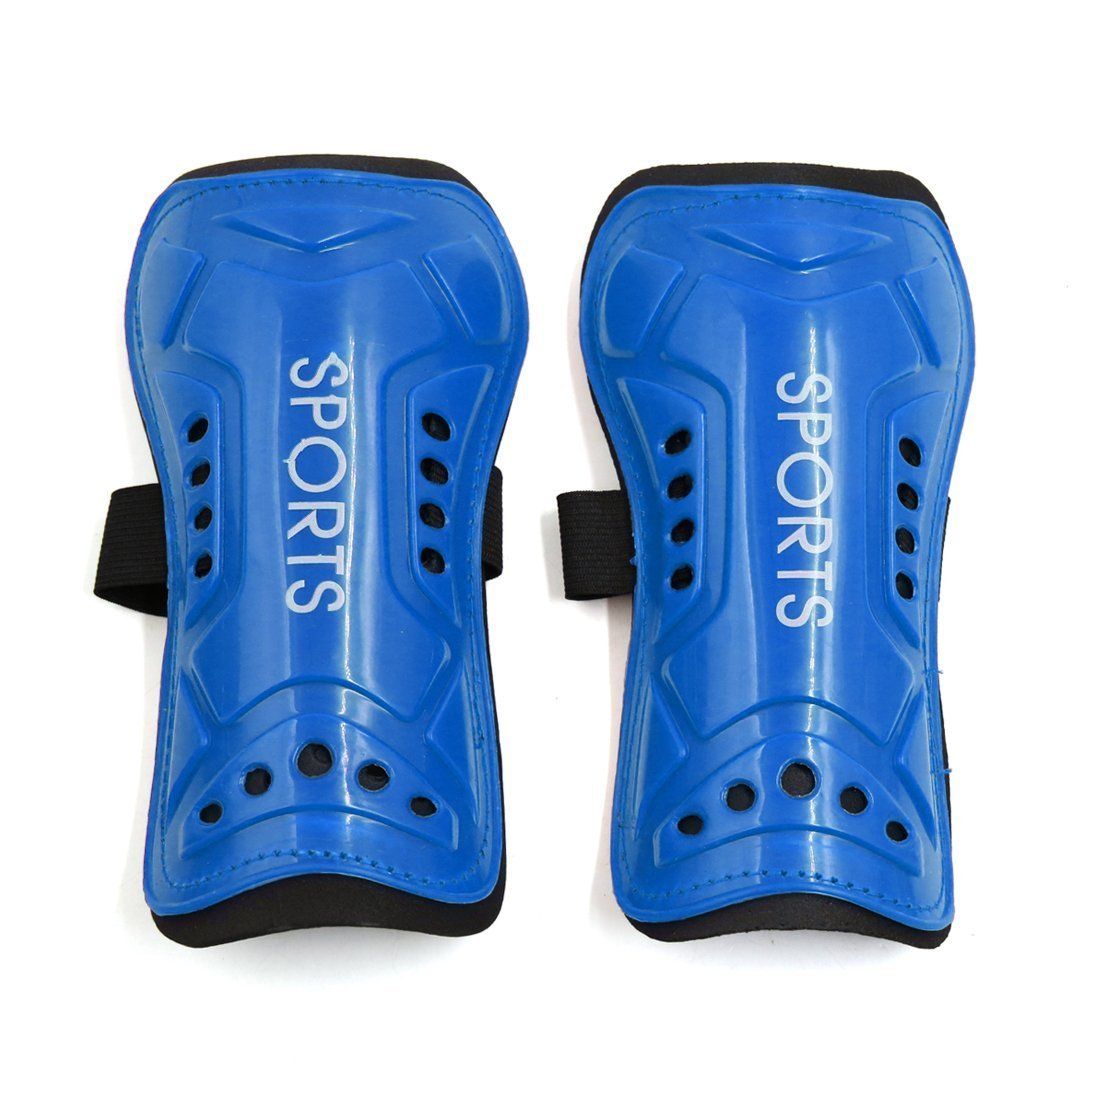 Vi.yo 1Paar, Fußball, Hockey, Fußball-mit Protektoren Shin Pads Vi.yo 1Paar Fußball blau 19.2cmX9.8cm